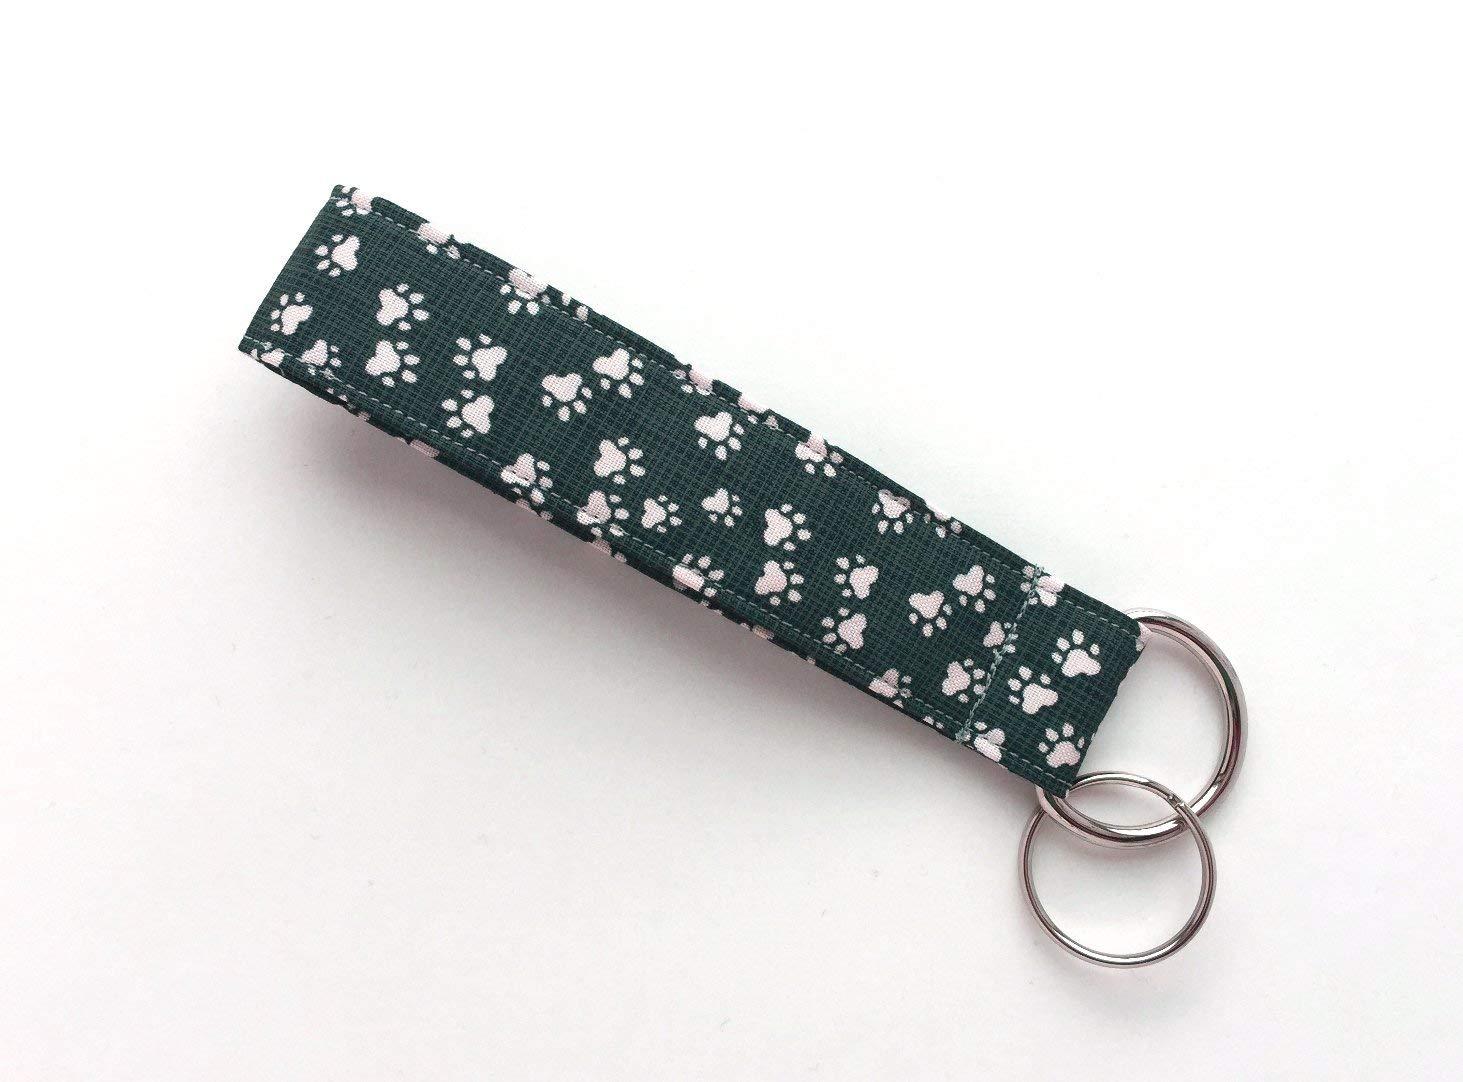 Wristlet Lanyard Wriststrap Cow Print Handmade Key Fob Strap ~ Keychain